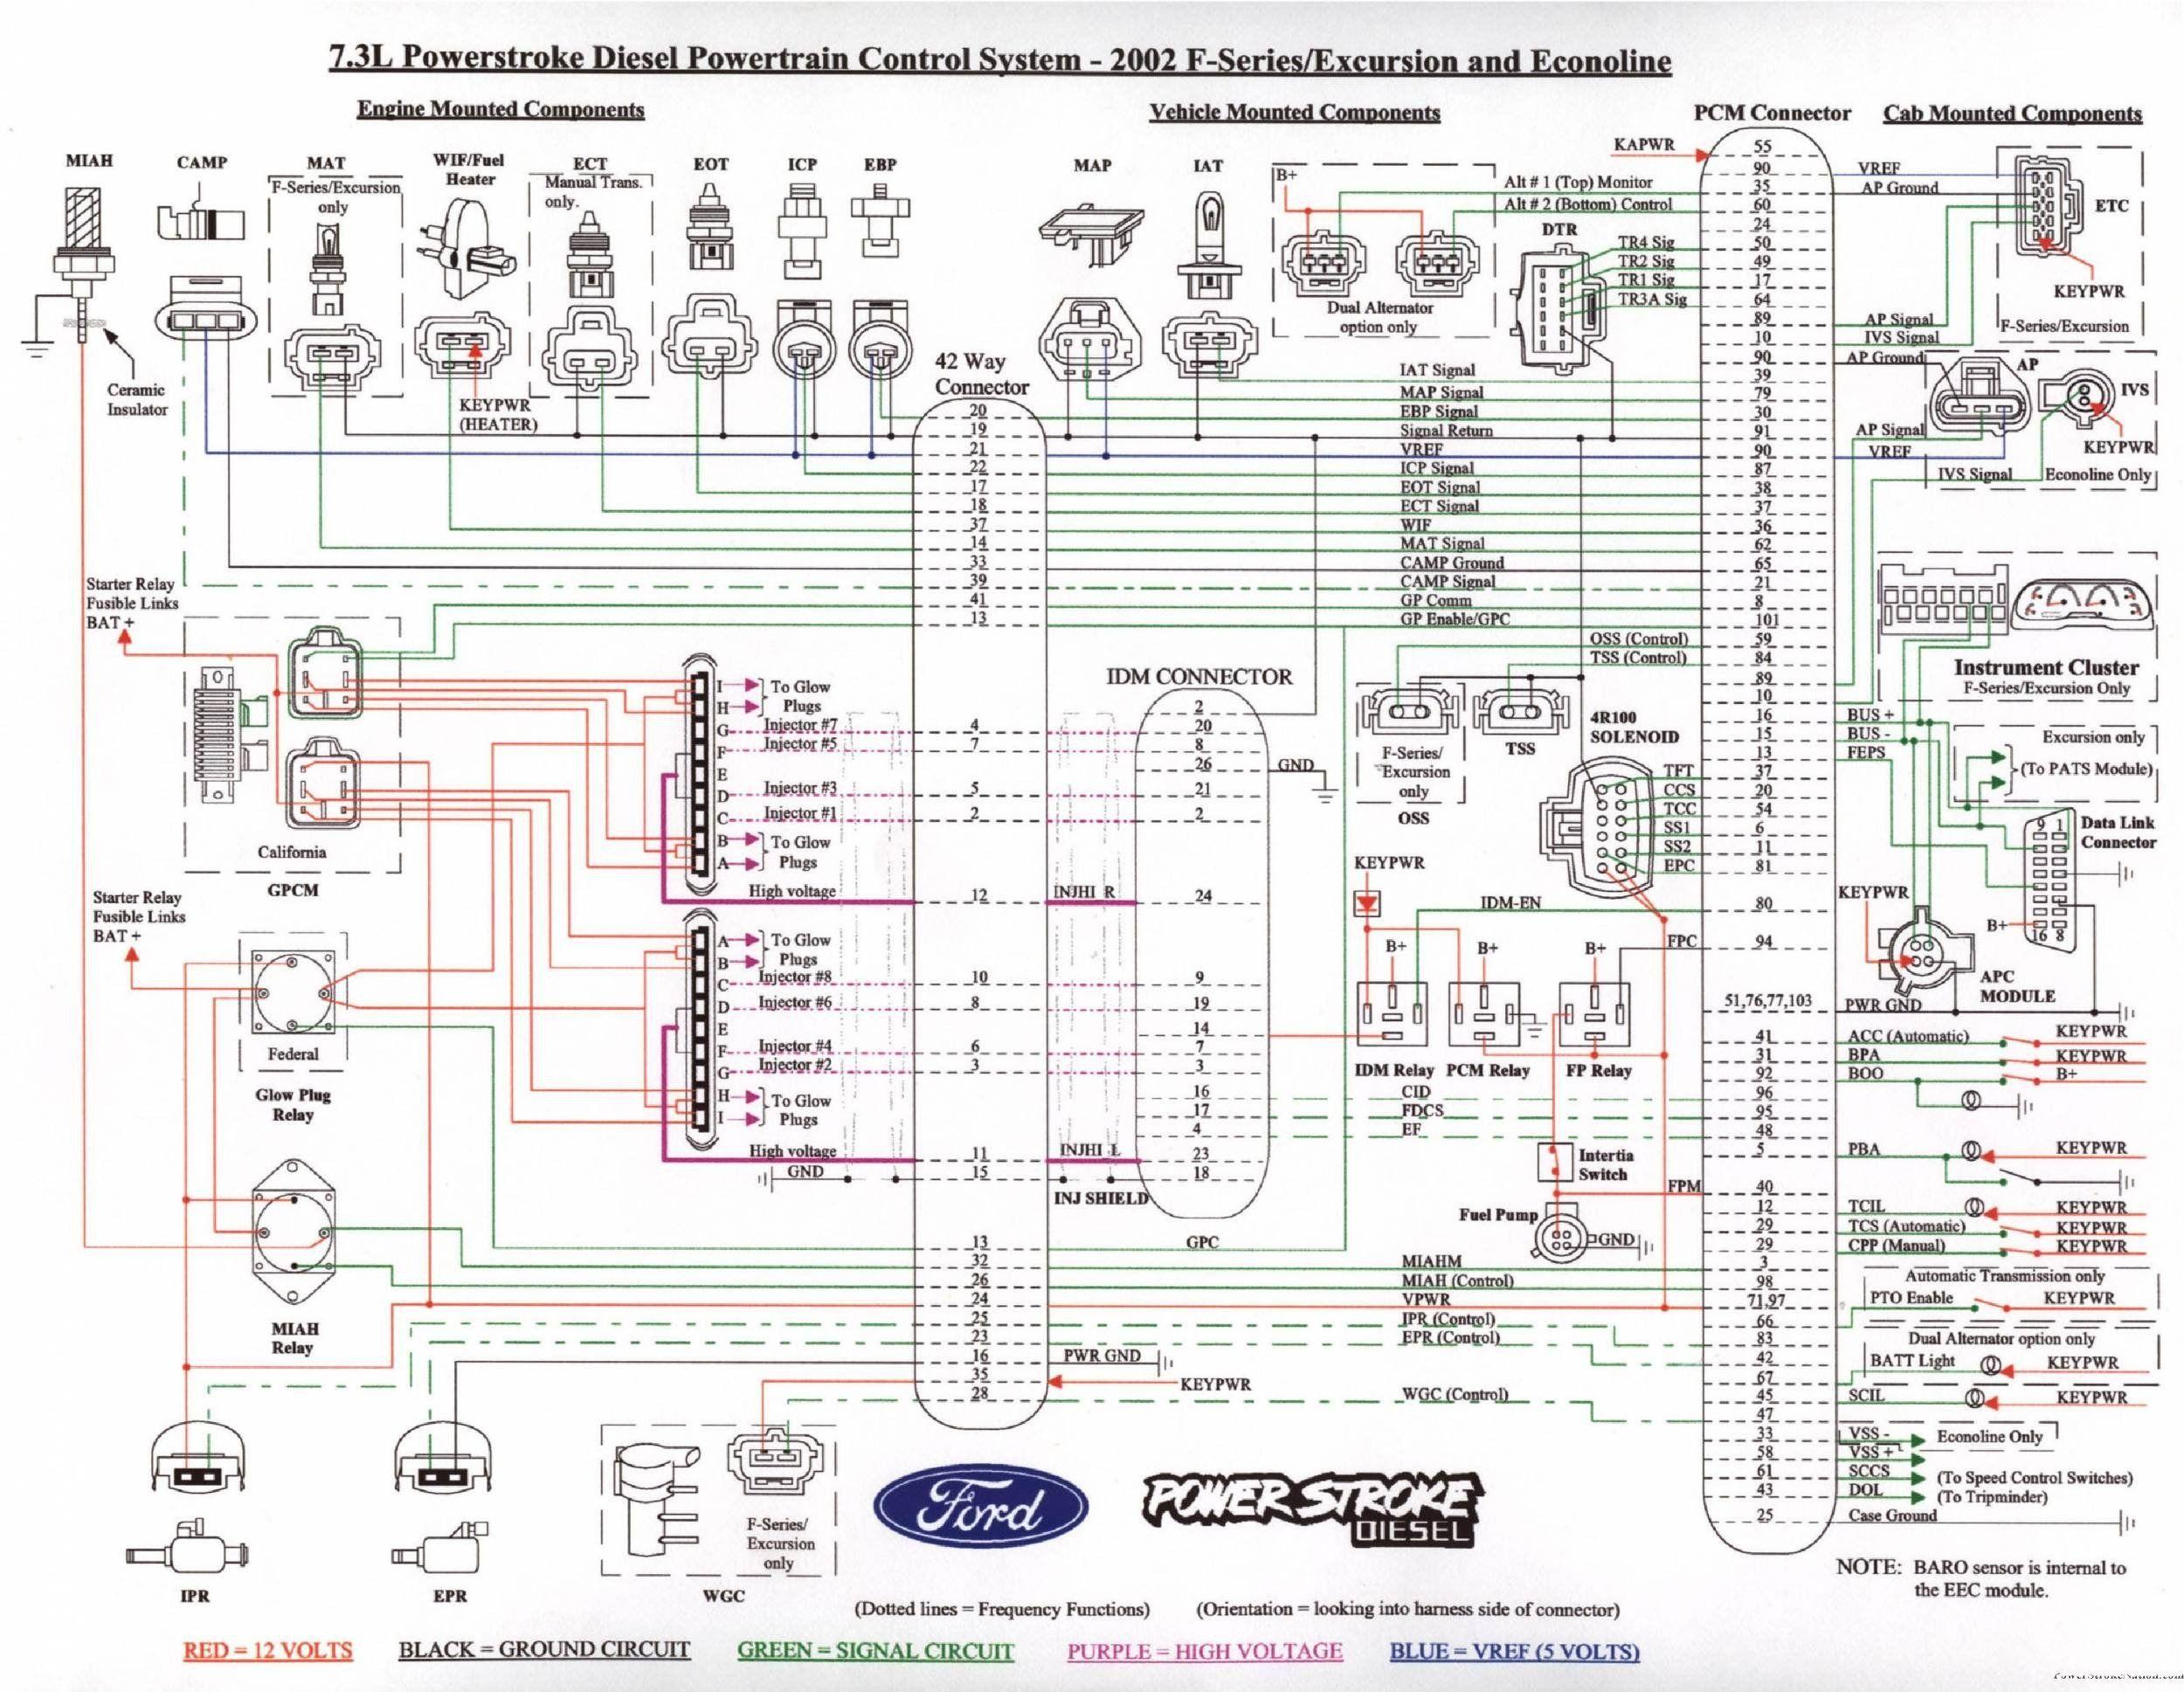 7 3 Wiring Harness Diagram Wiring Diagram Raw 7 3 Powerstroke Fuel Bowl Heater 7 3 Powerstroke